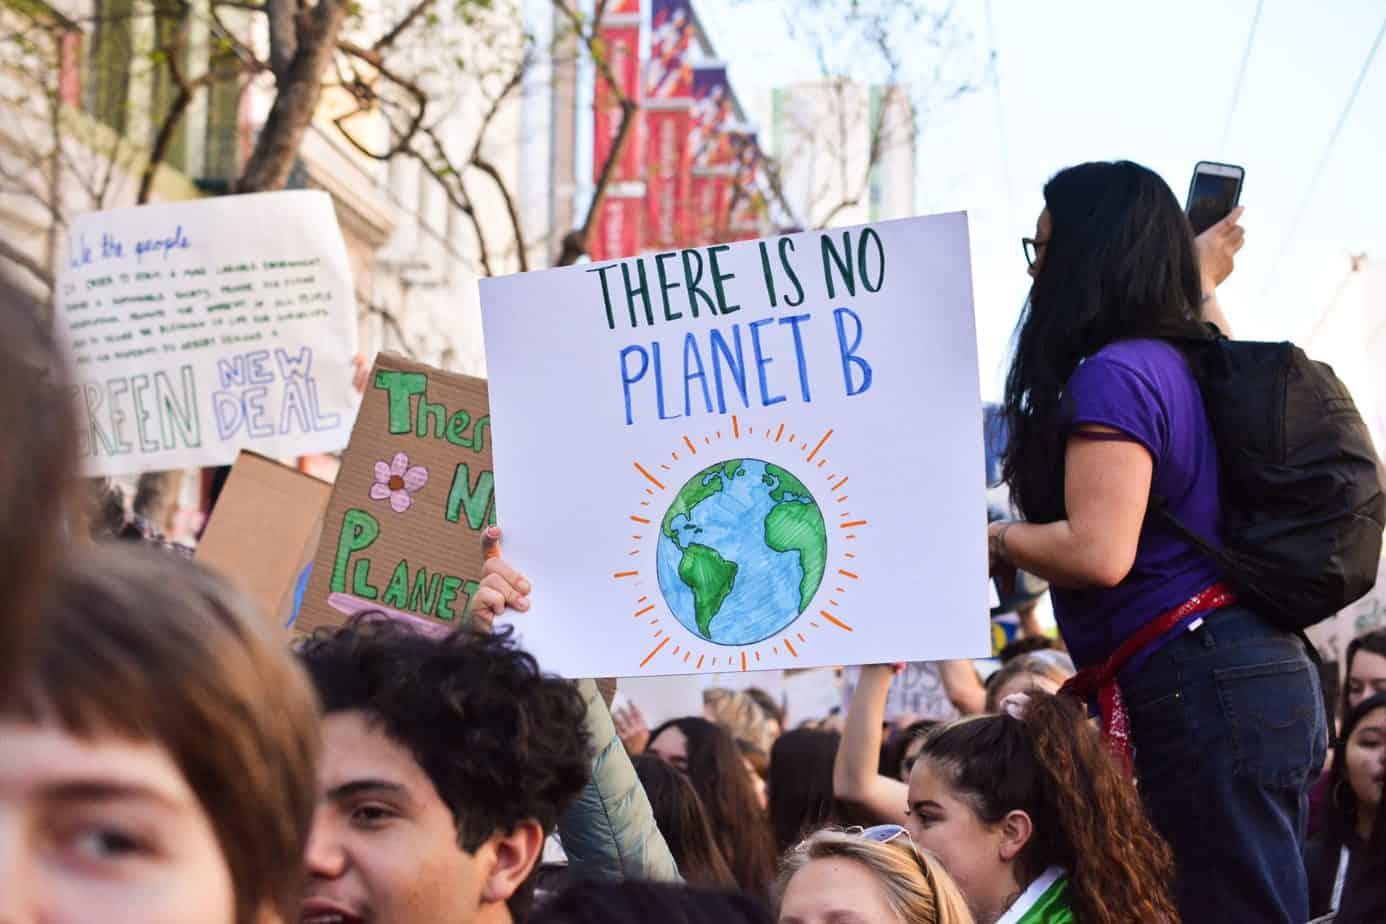 ireland acting on climate change